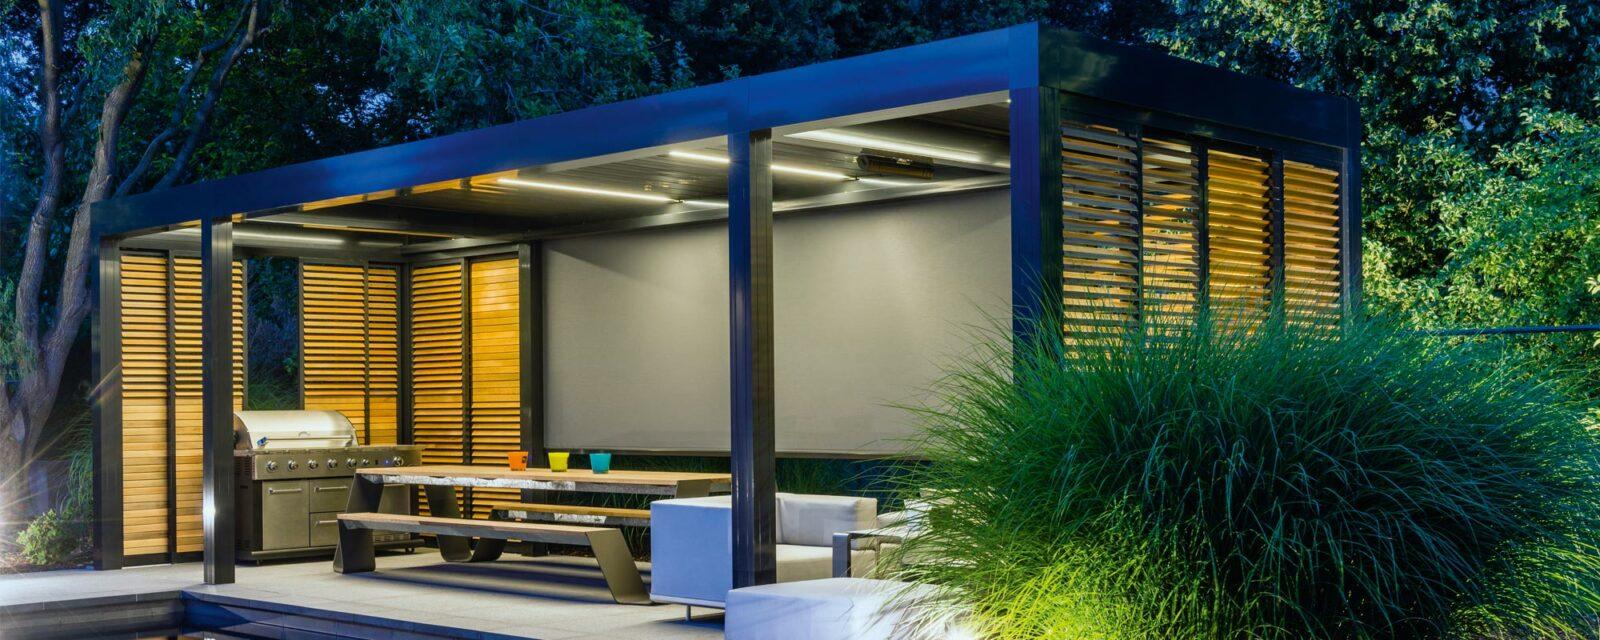 pergola brise soleil slider 3 tradidemeures. Black Bedroom Furniture Sets. Home Design Ideas